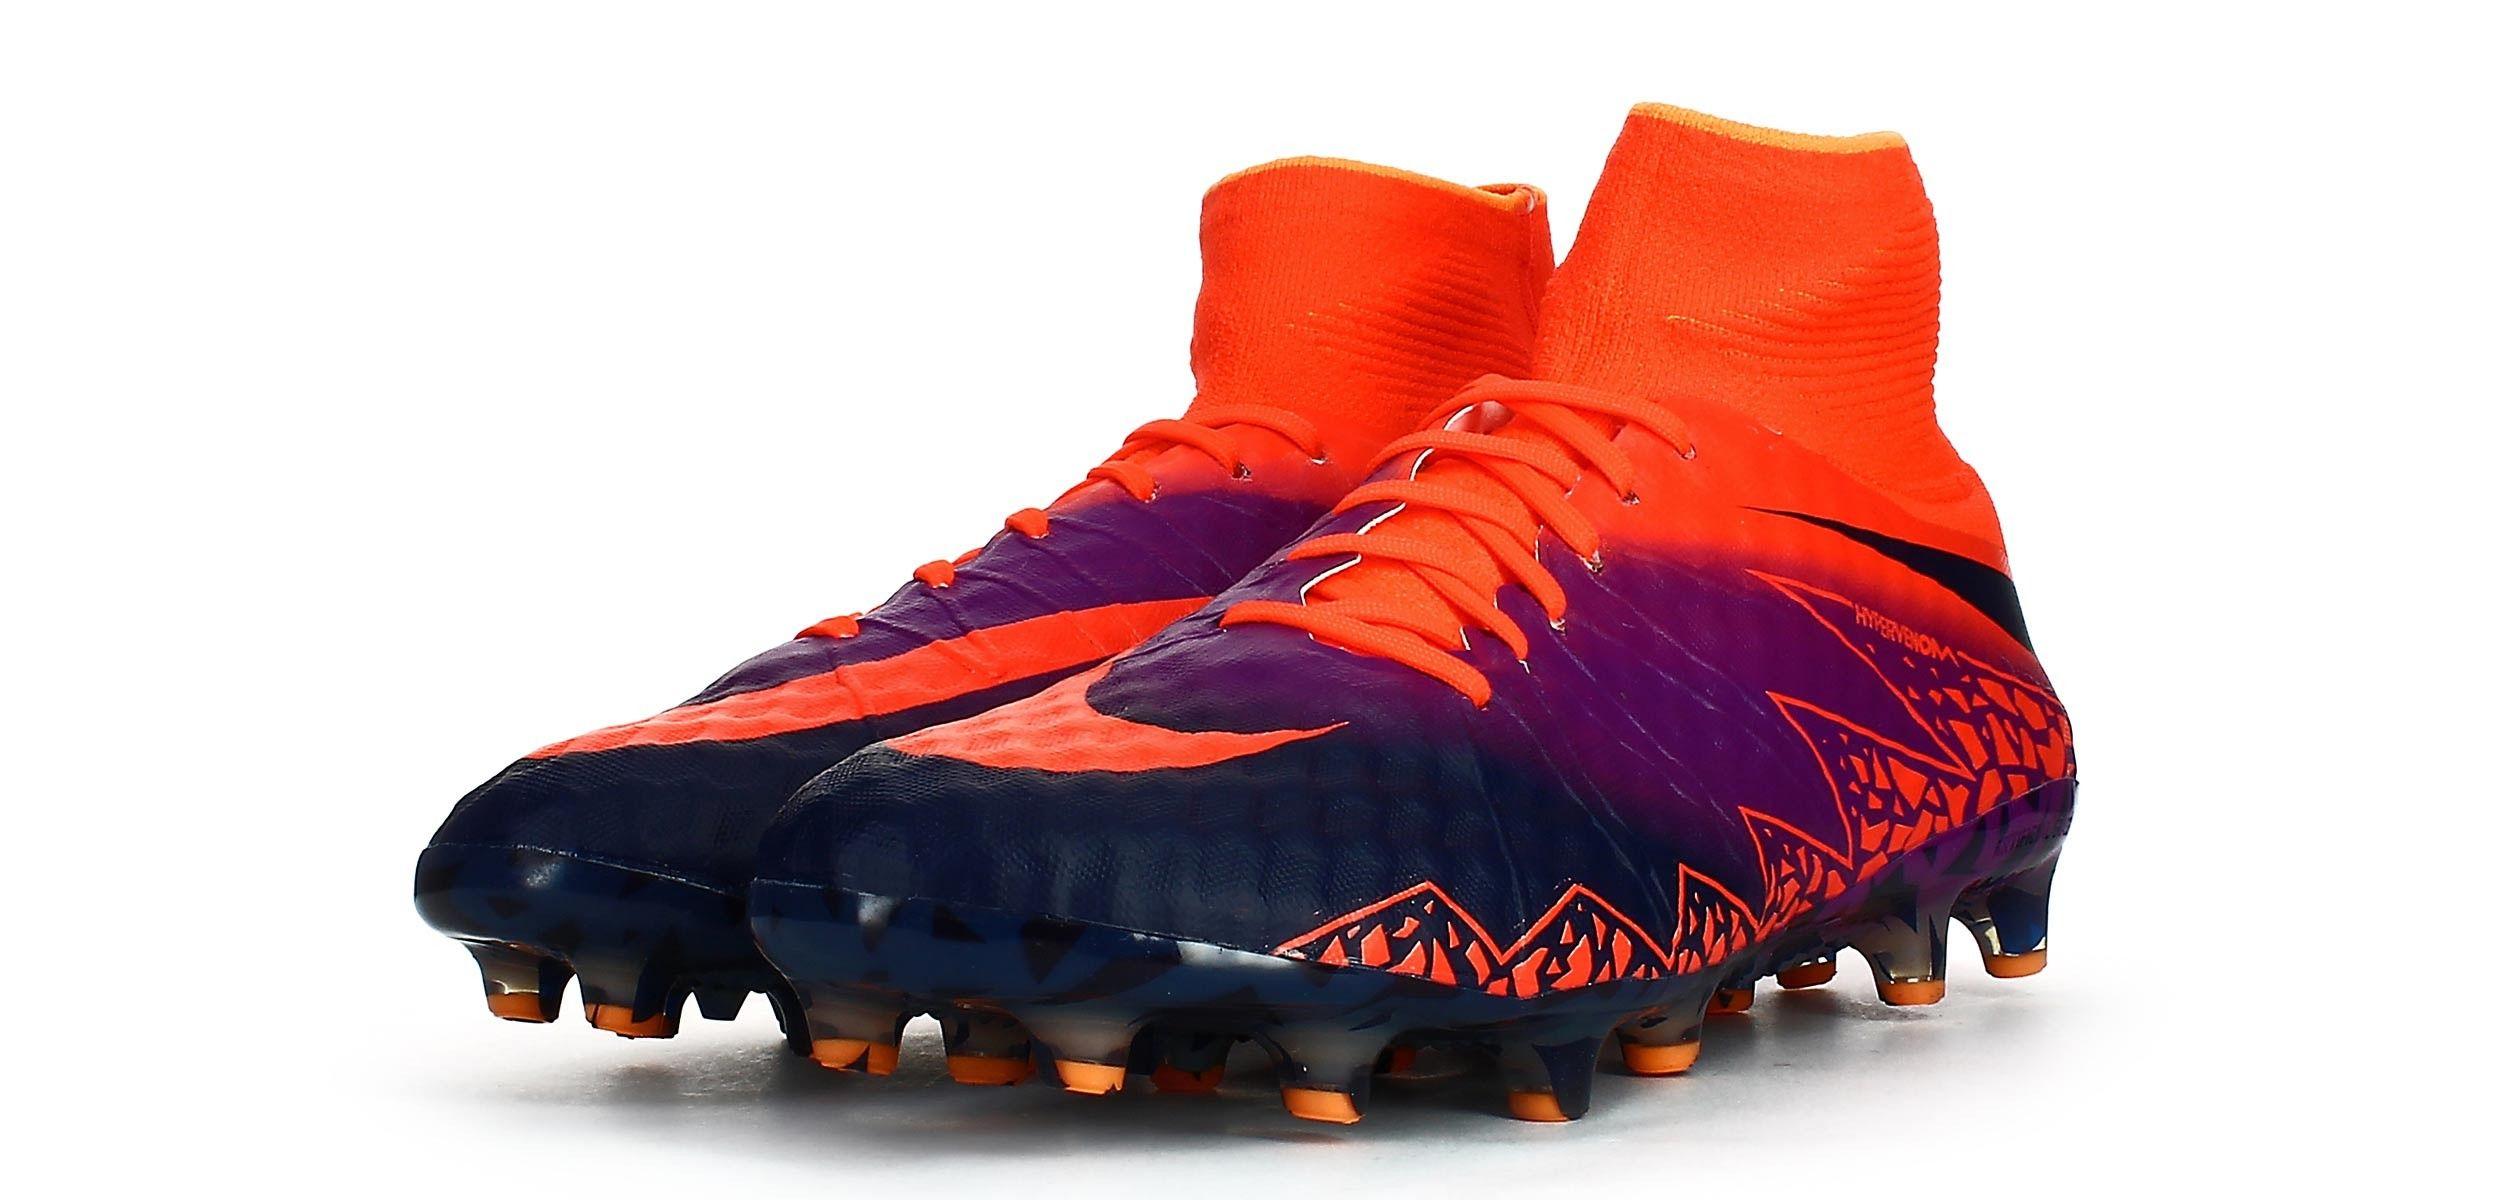 Botas de fútbol Nike Hypervenom Phantom II AG-PRO - Rojo Carmesí   Púrpura  Vivid - Perspectiva conjunta 72667a5eace58